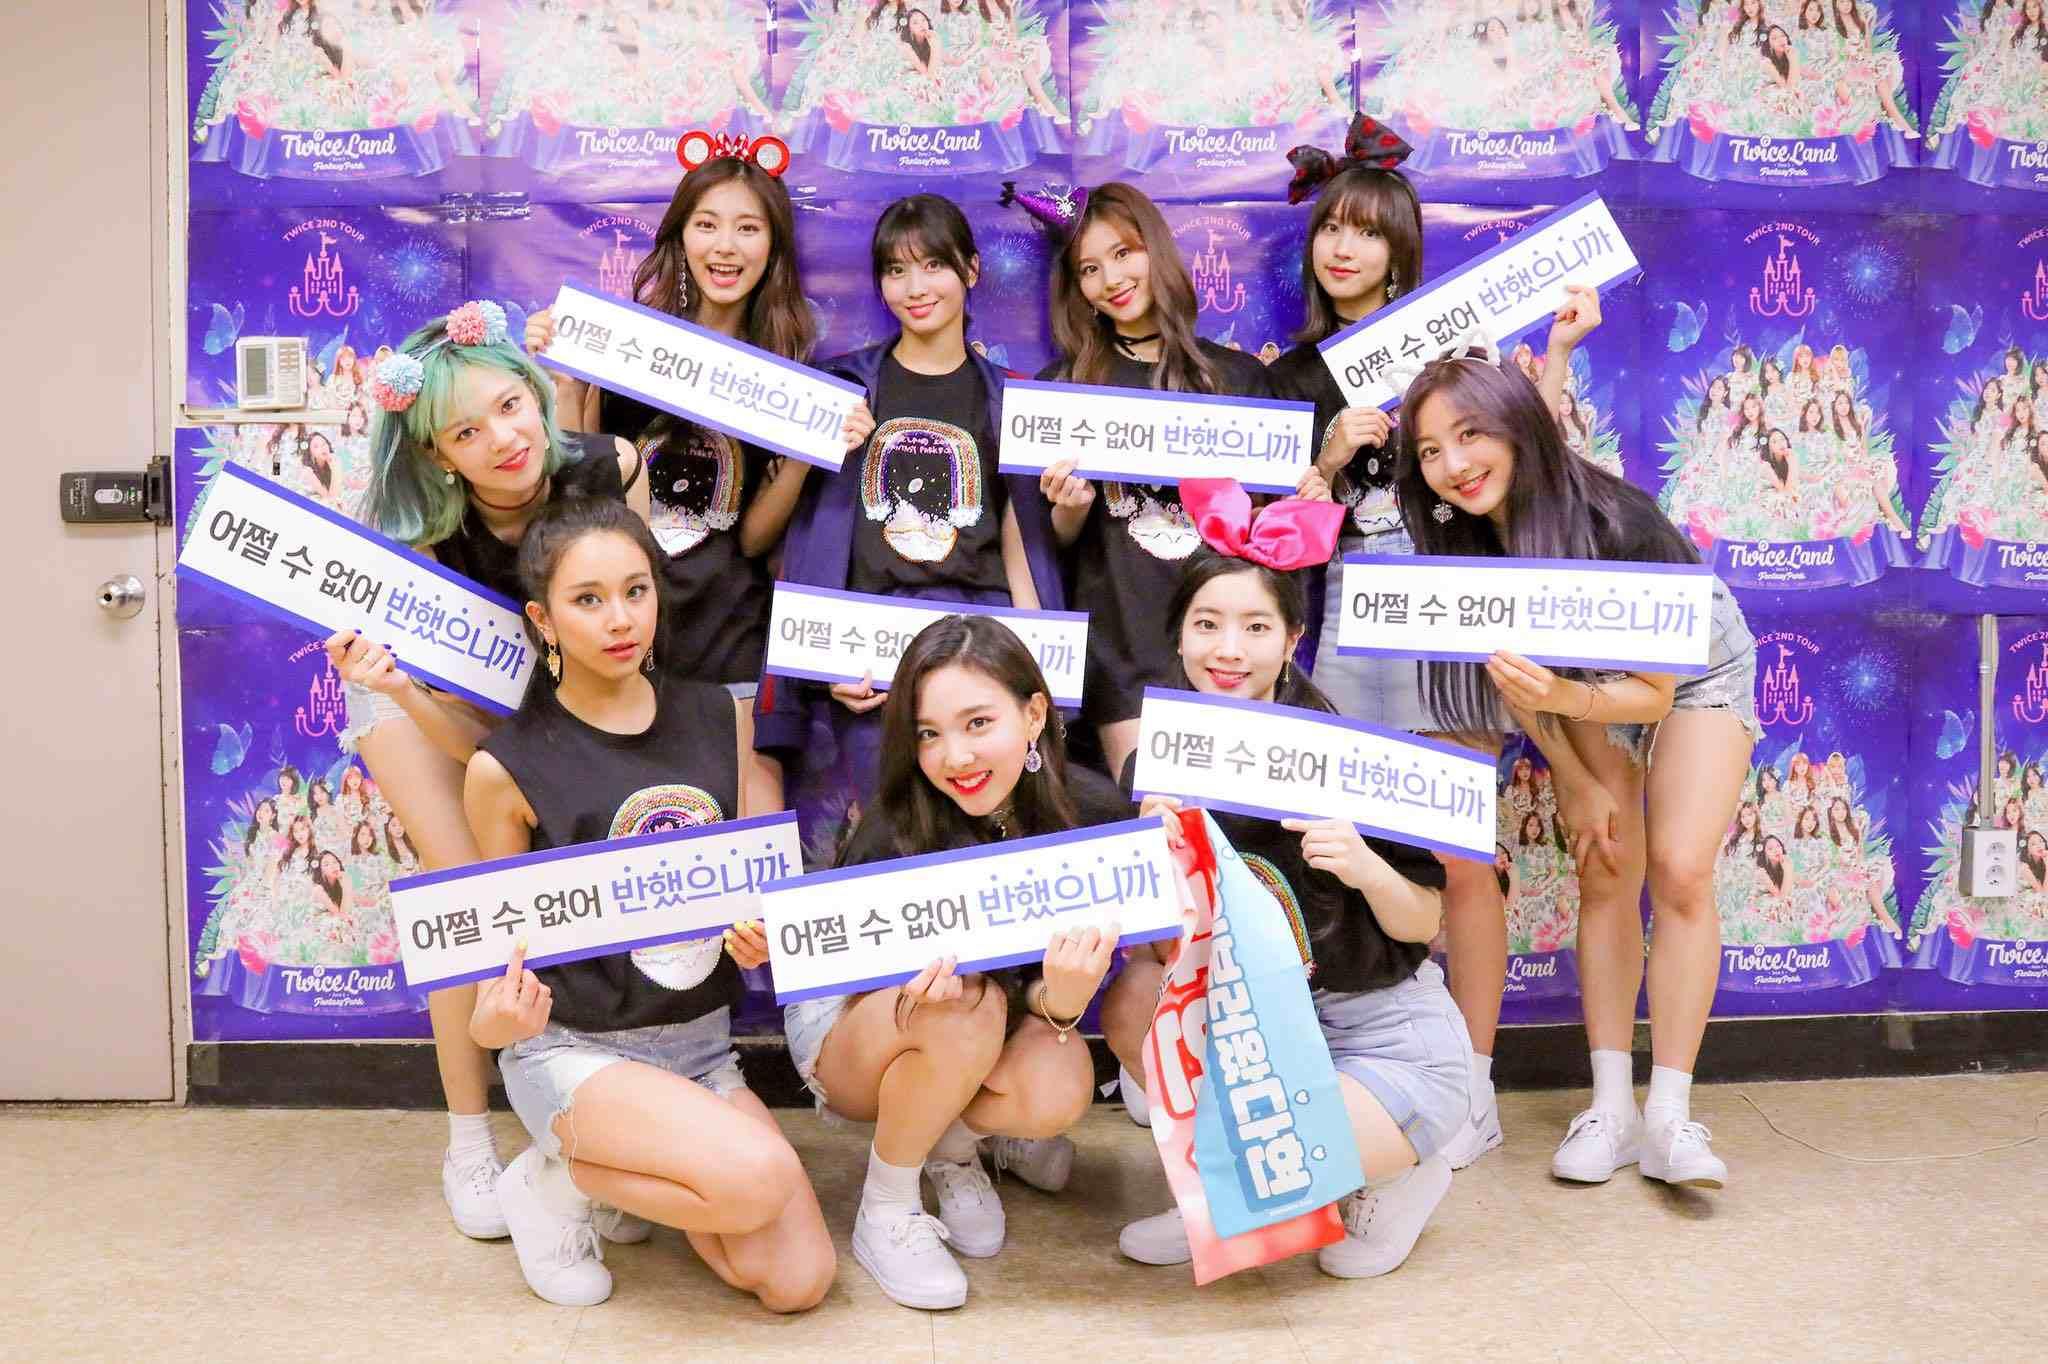 TWICE近年橫掃韓國與海外市場,除了成員魅力之外,多國籍的組合也被認為是成員能夠攻陷日韓及海外市場的主因。不過因為成員國籍不同,所以在意思表達上也很有特色,像是子瑜就因為說話的語氣很生硬,而常被姐姐們說「很鐵壁」